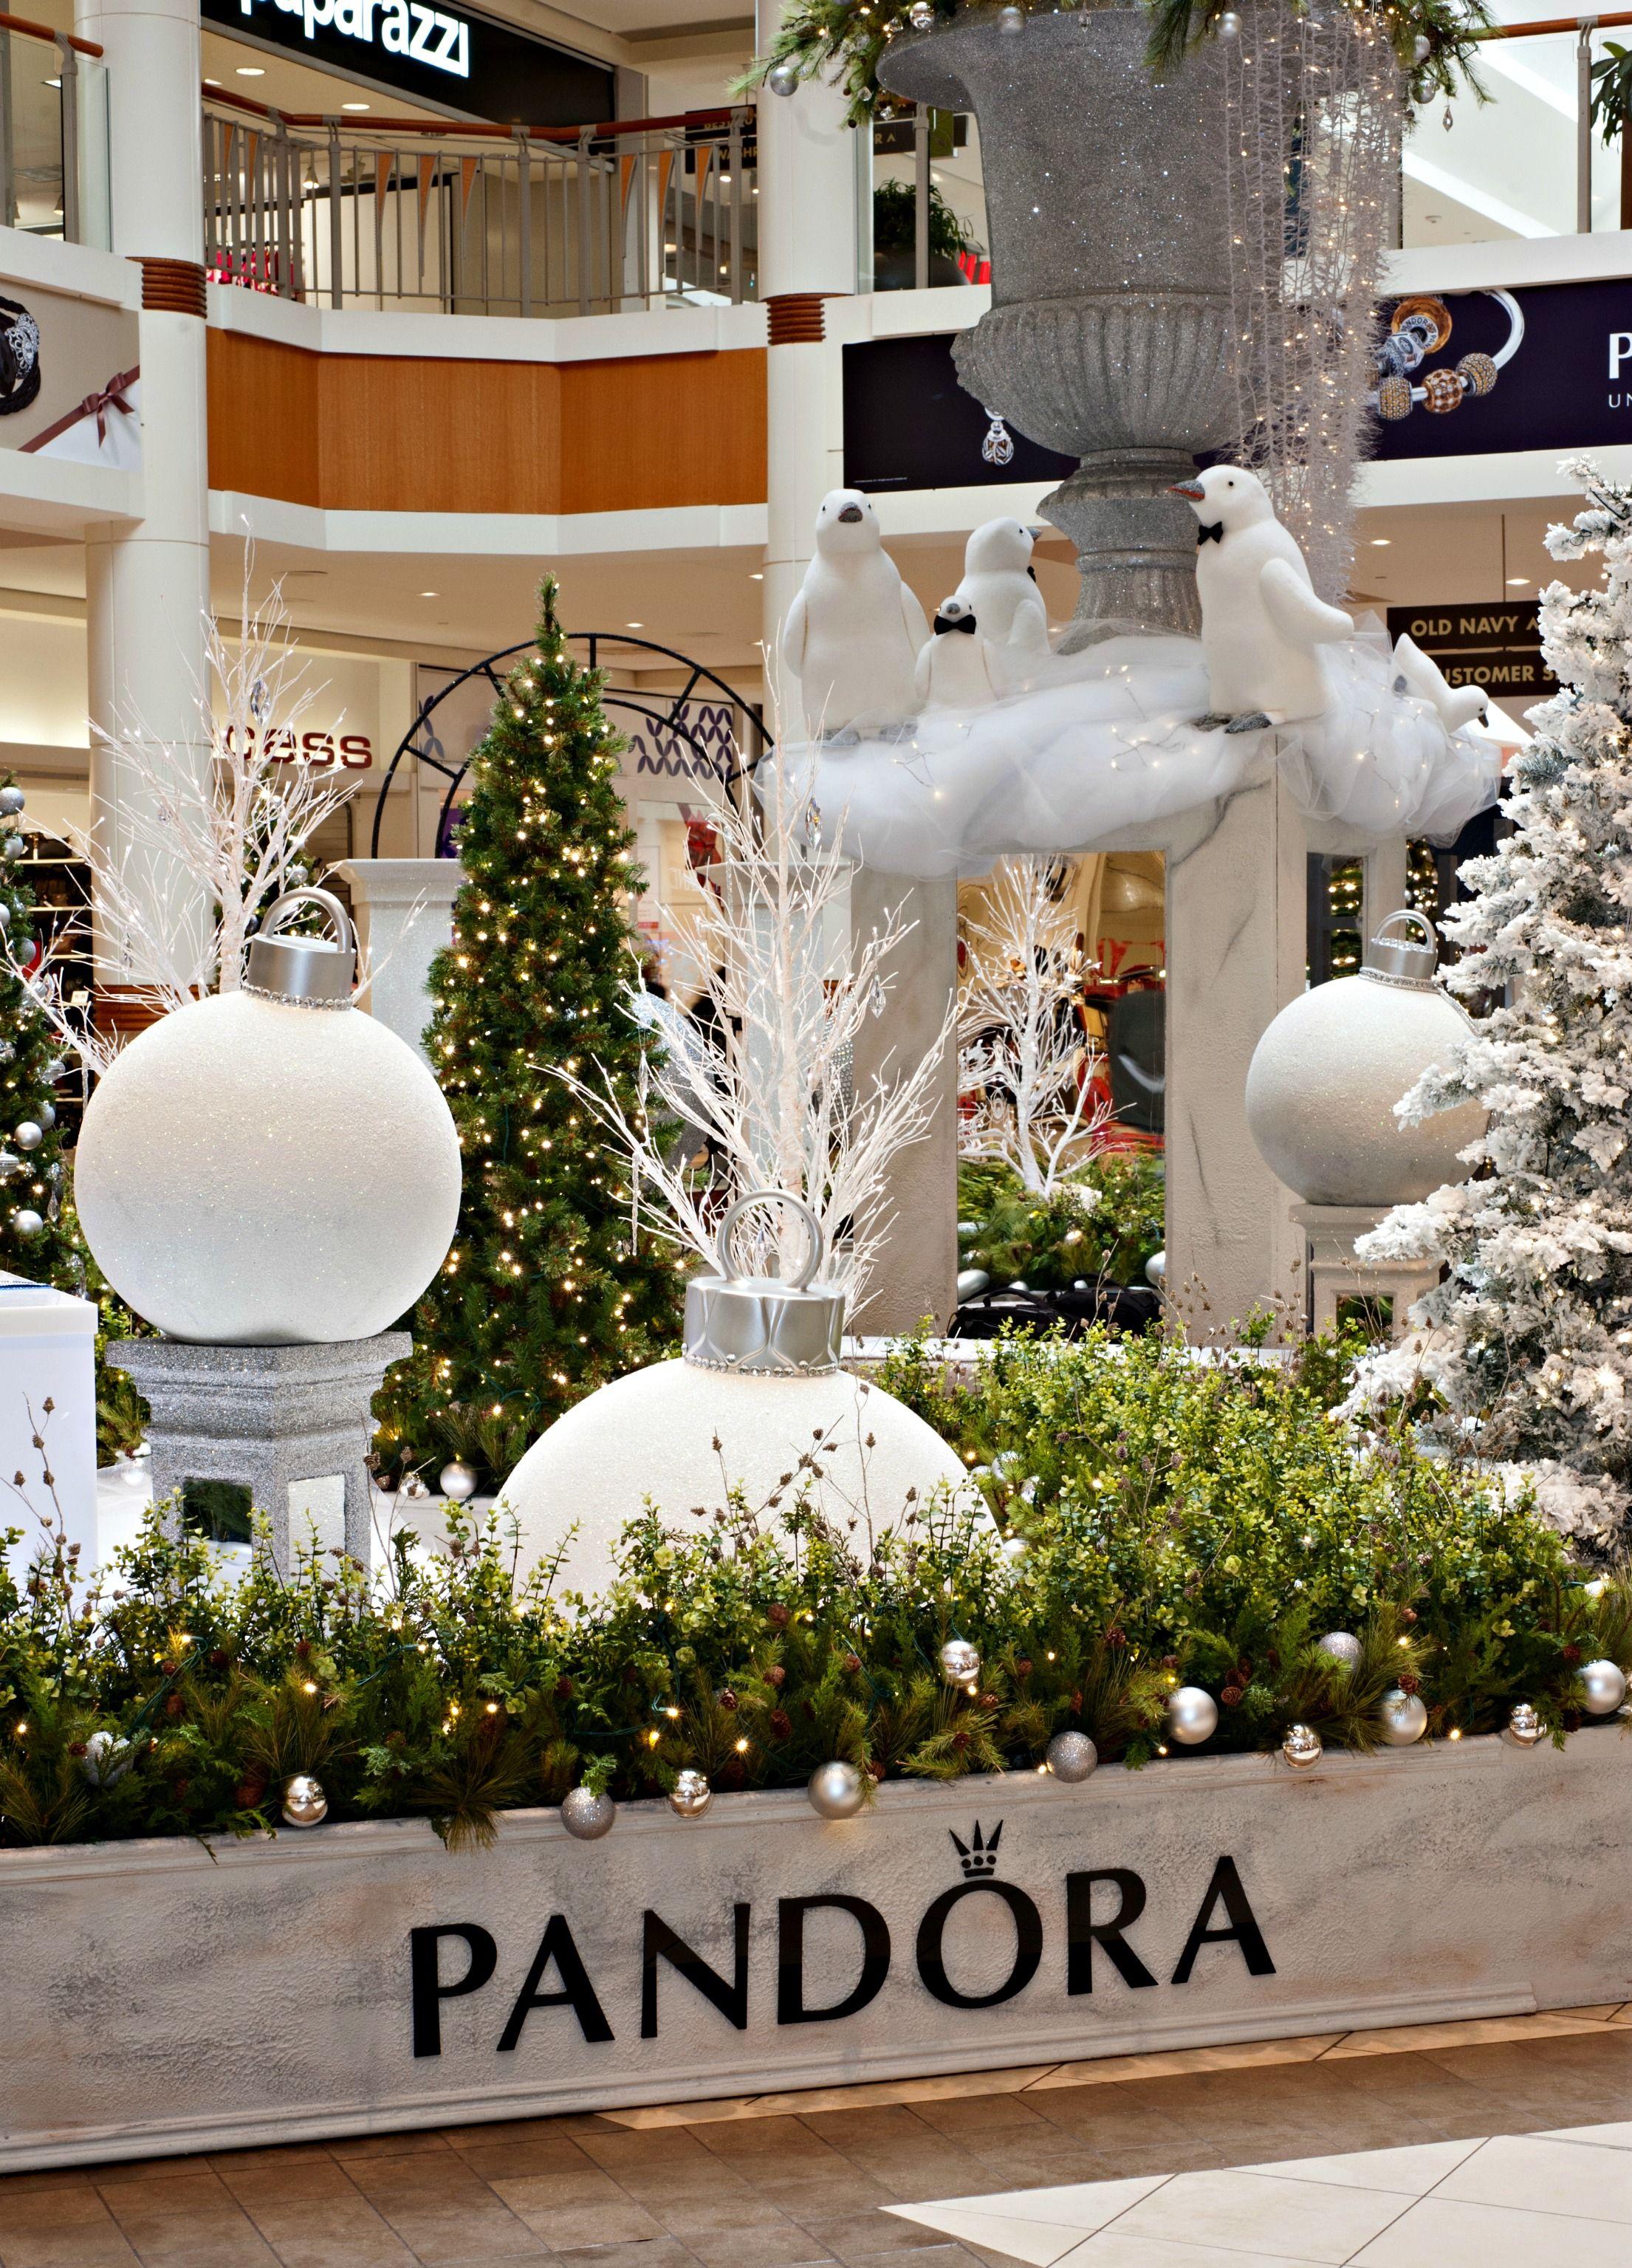 Check out this beautiful Pandora Winter Wonderland Santa set at BCC.  Stunning partnership between Pandora and #BramaleaCityCentre